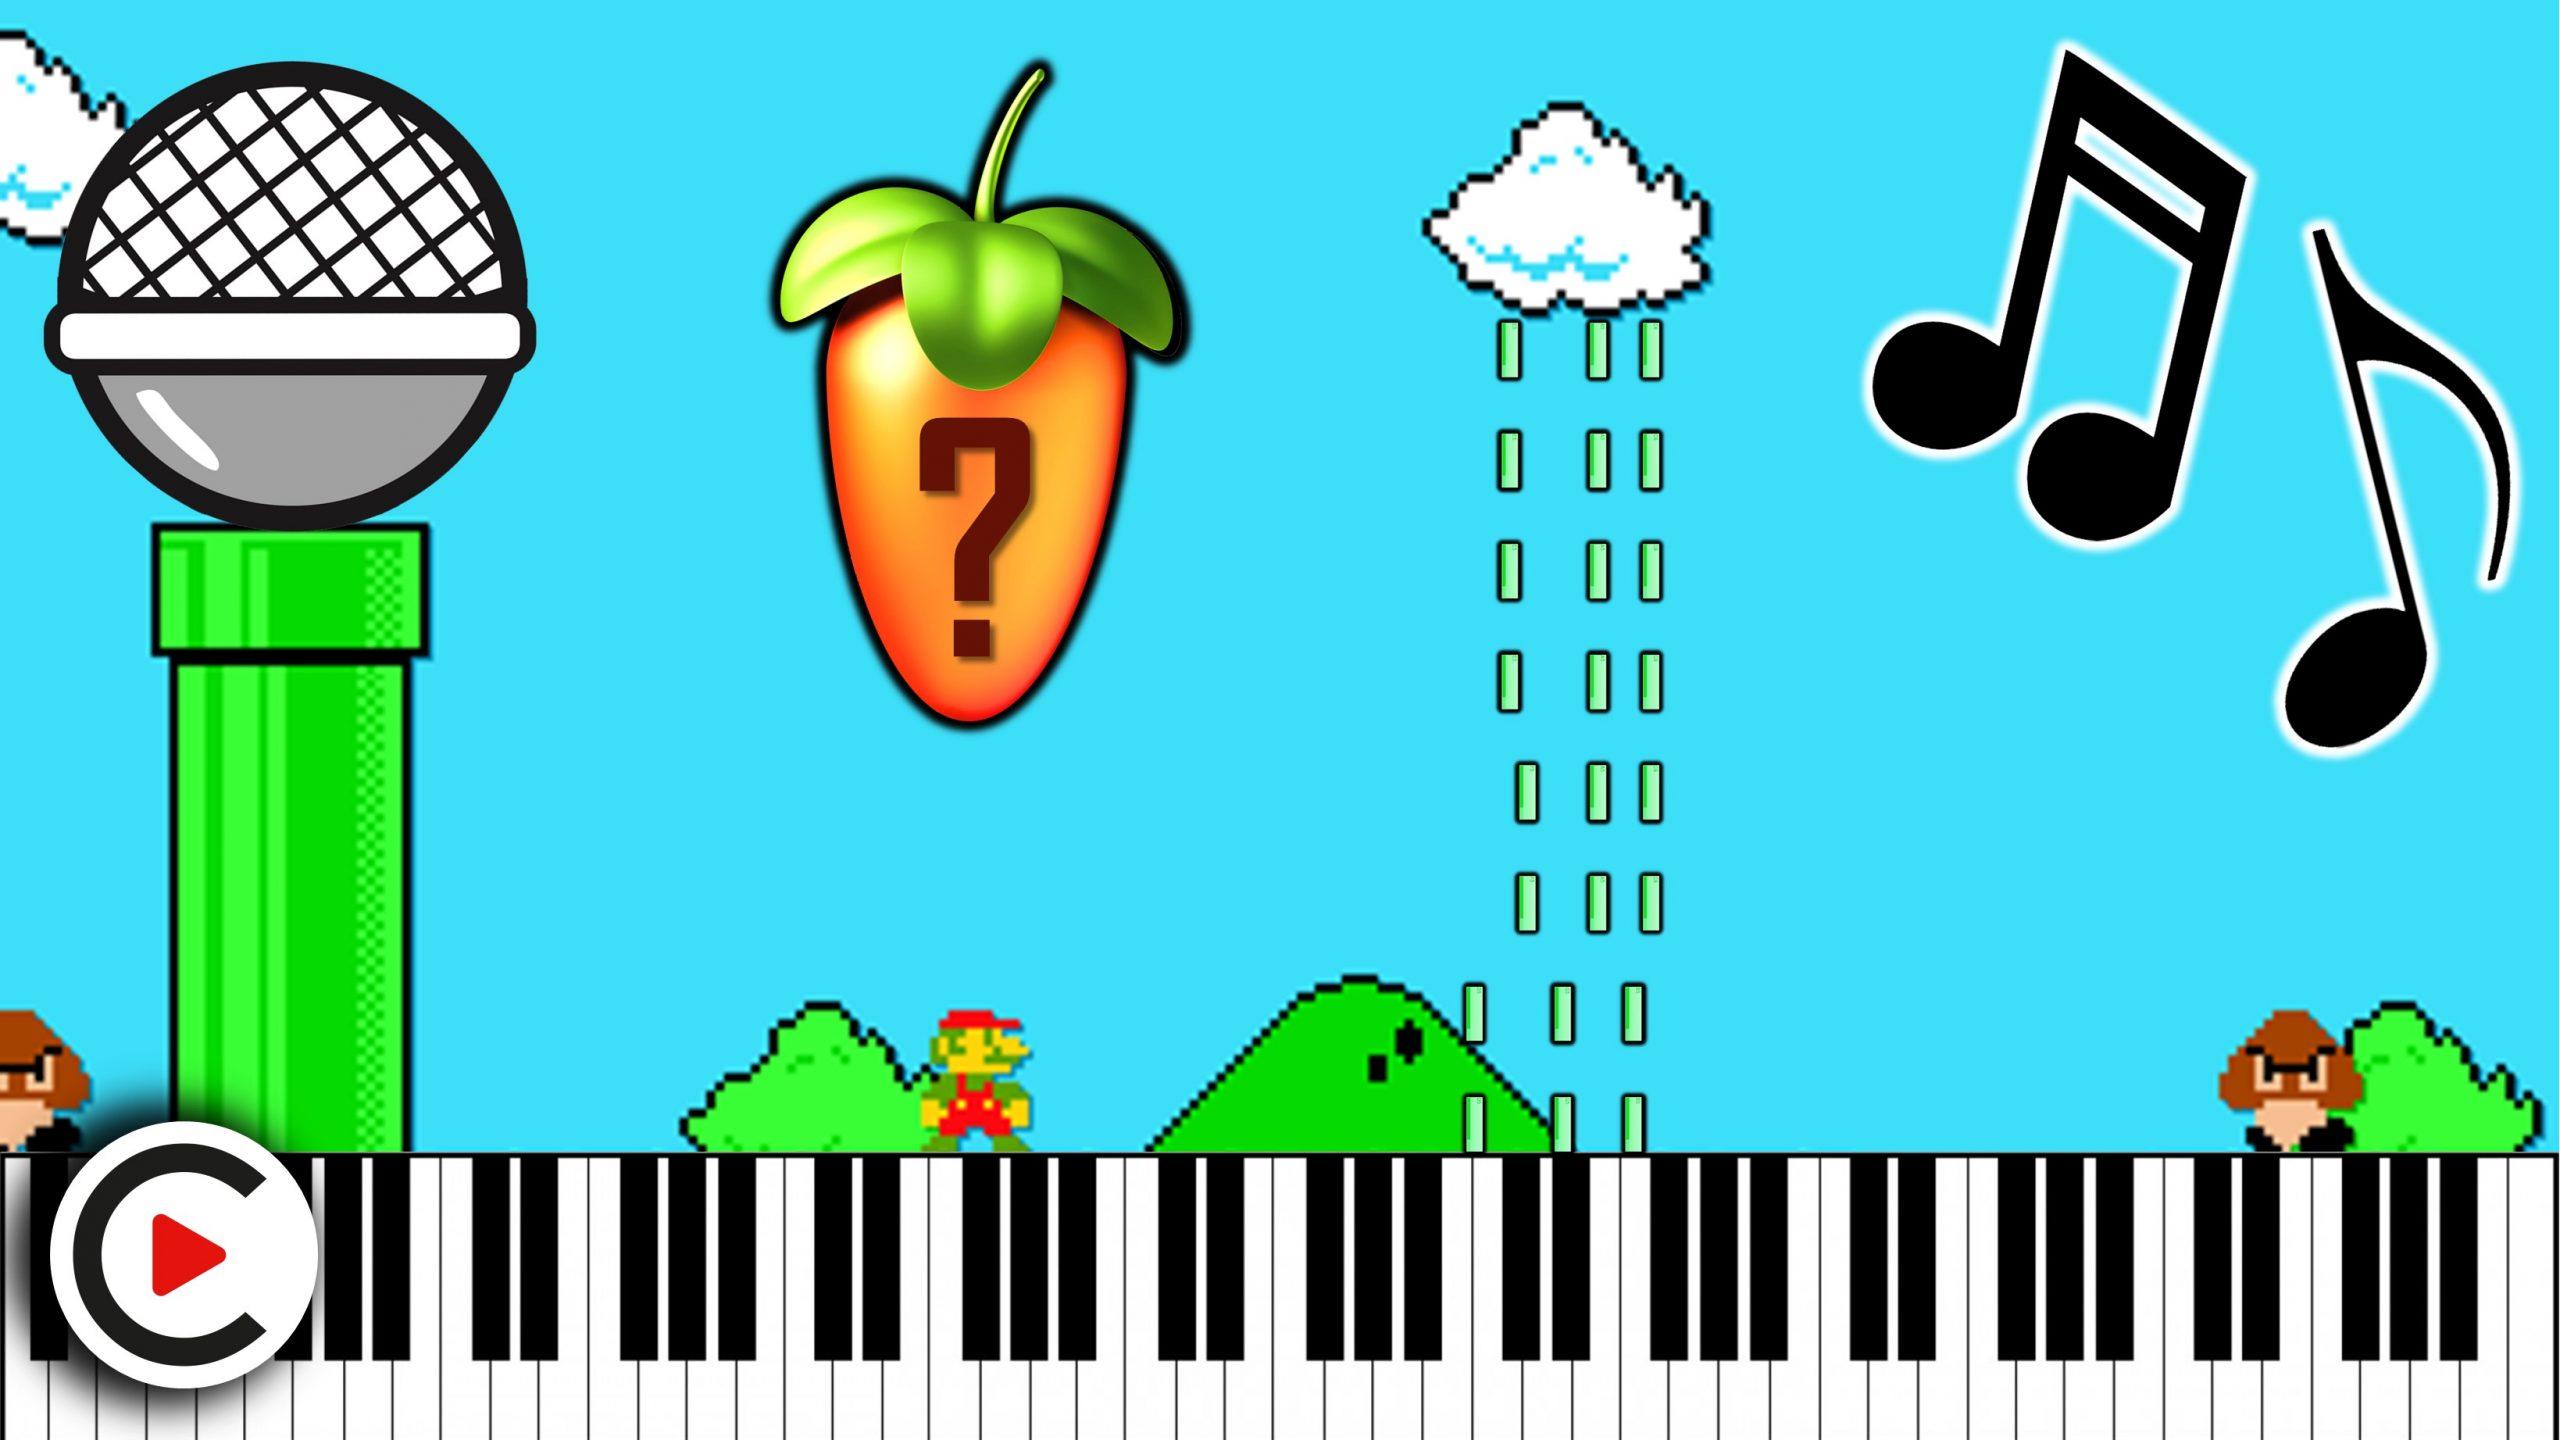 This Is How To Make Retro Game Music Nintendo 8 Bit Video Game Music Tutorial Fl Studio Nes Vst Screech House